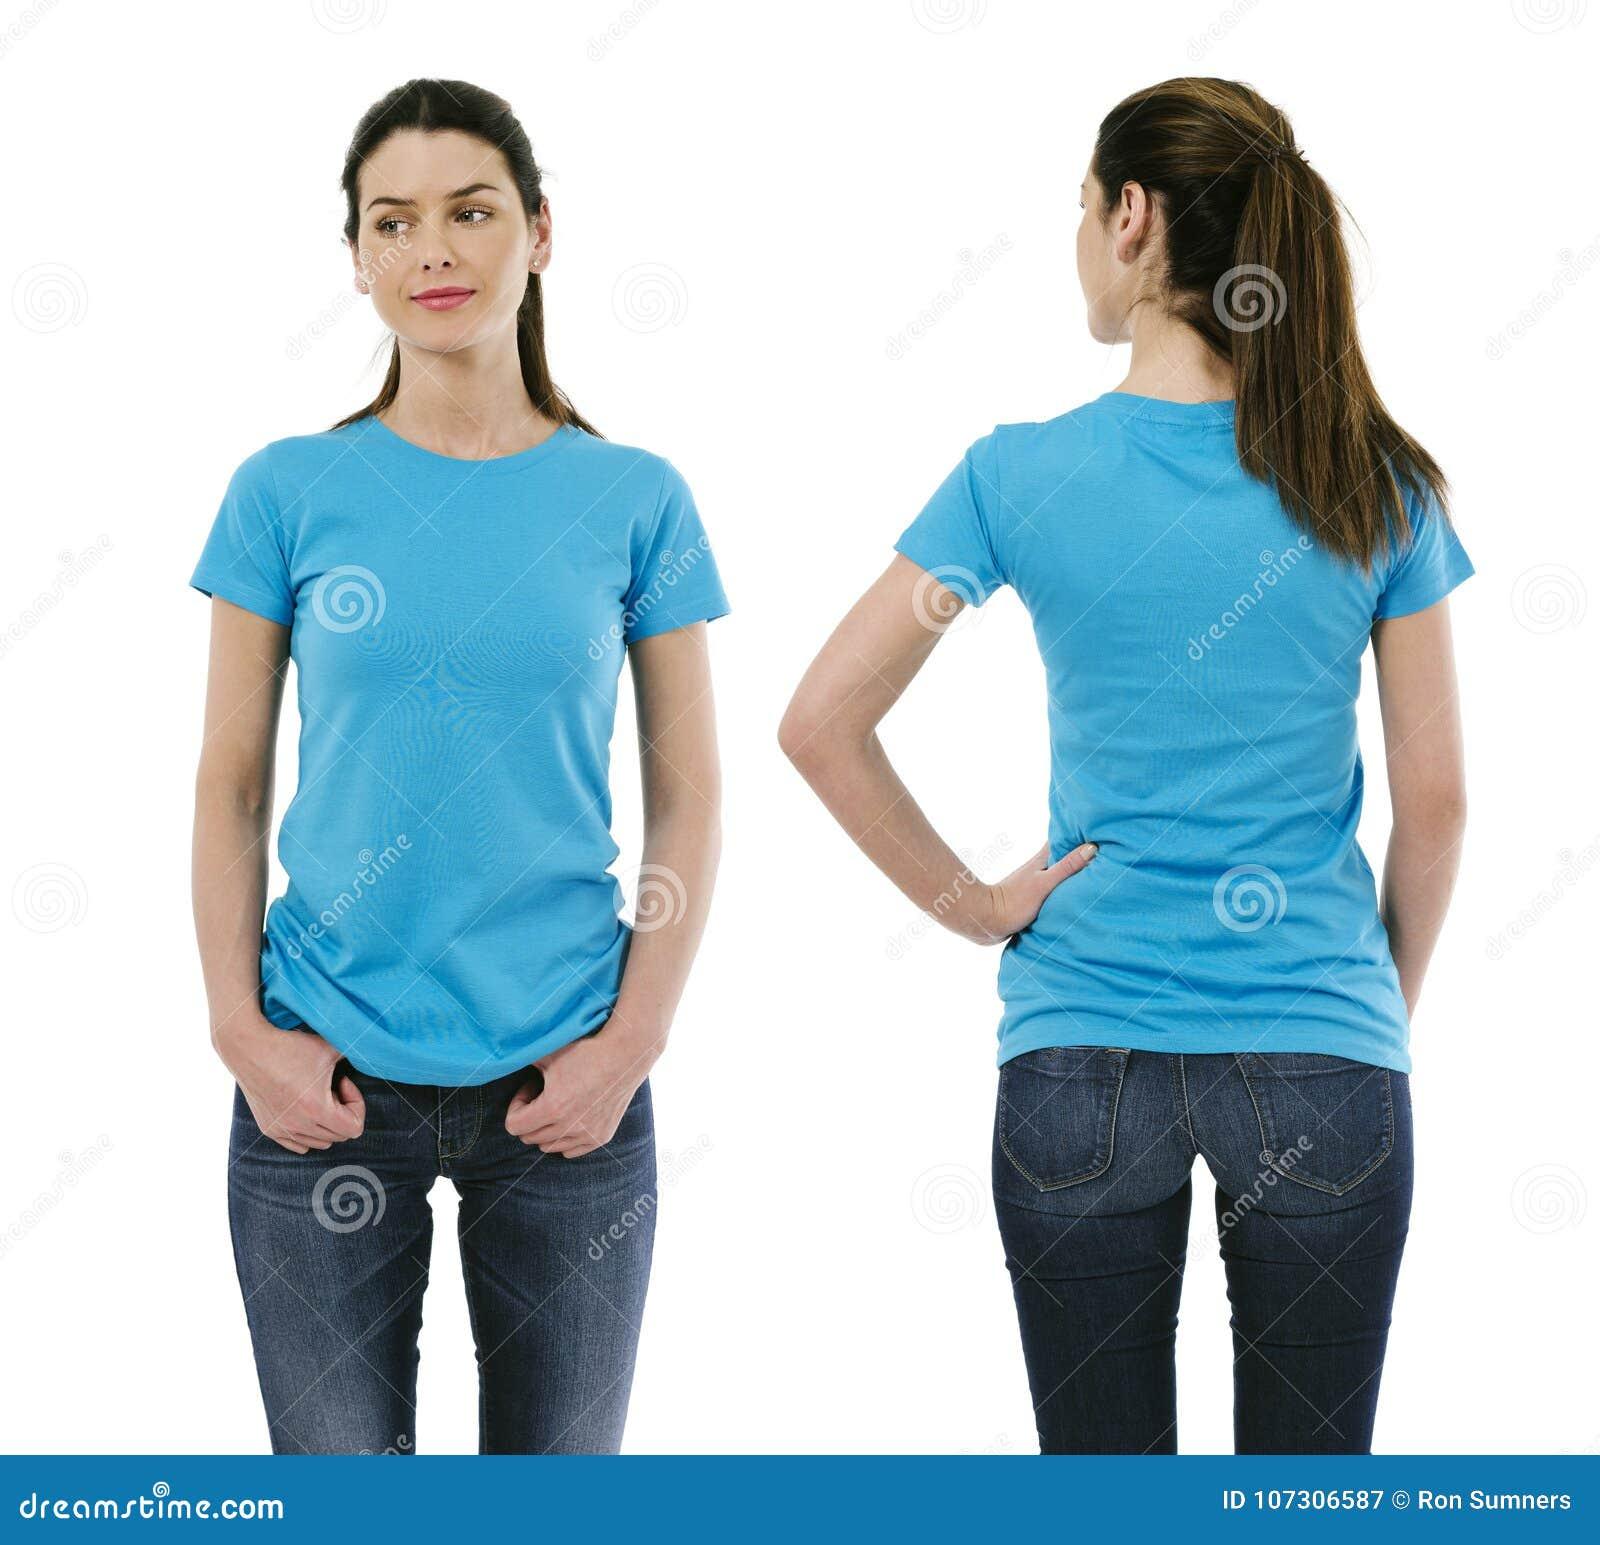 Brunette woman wearing blank light blue shirt